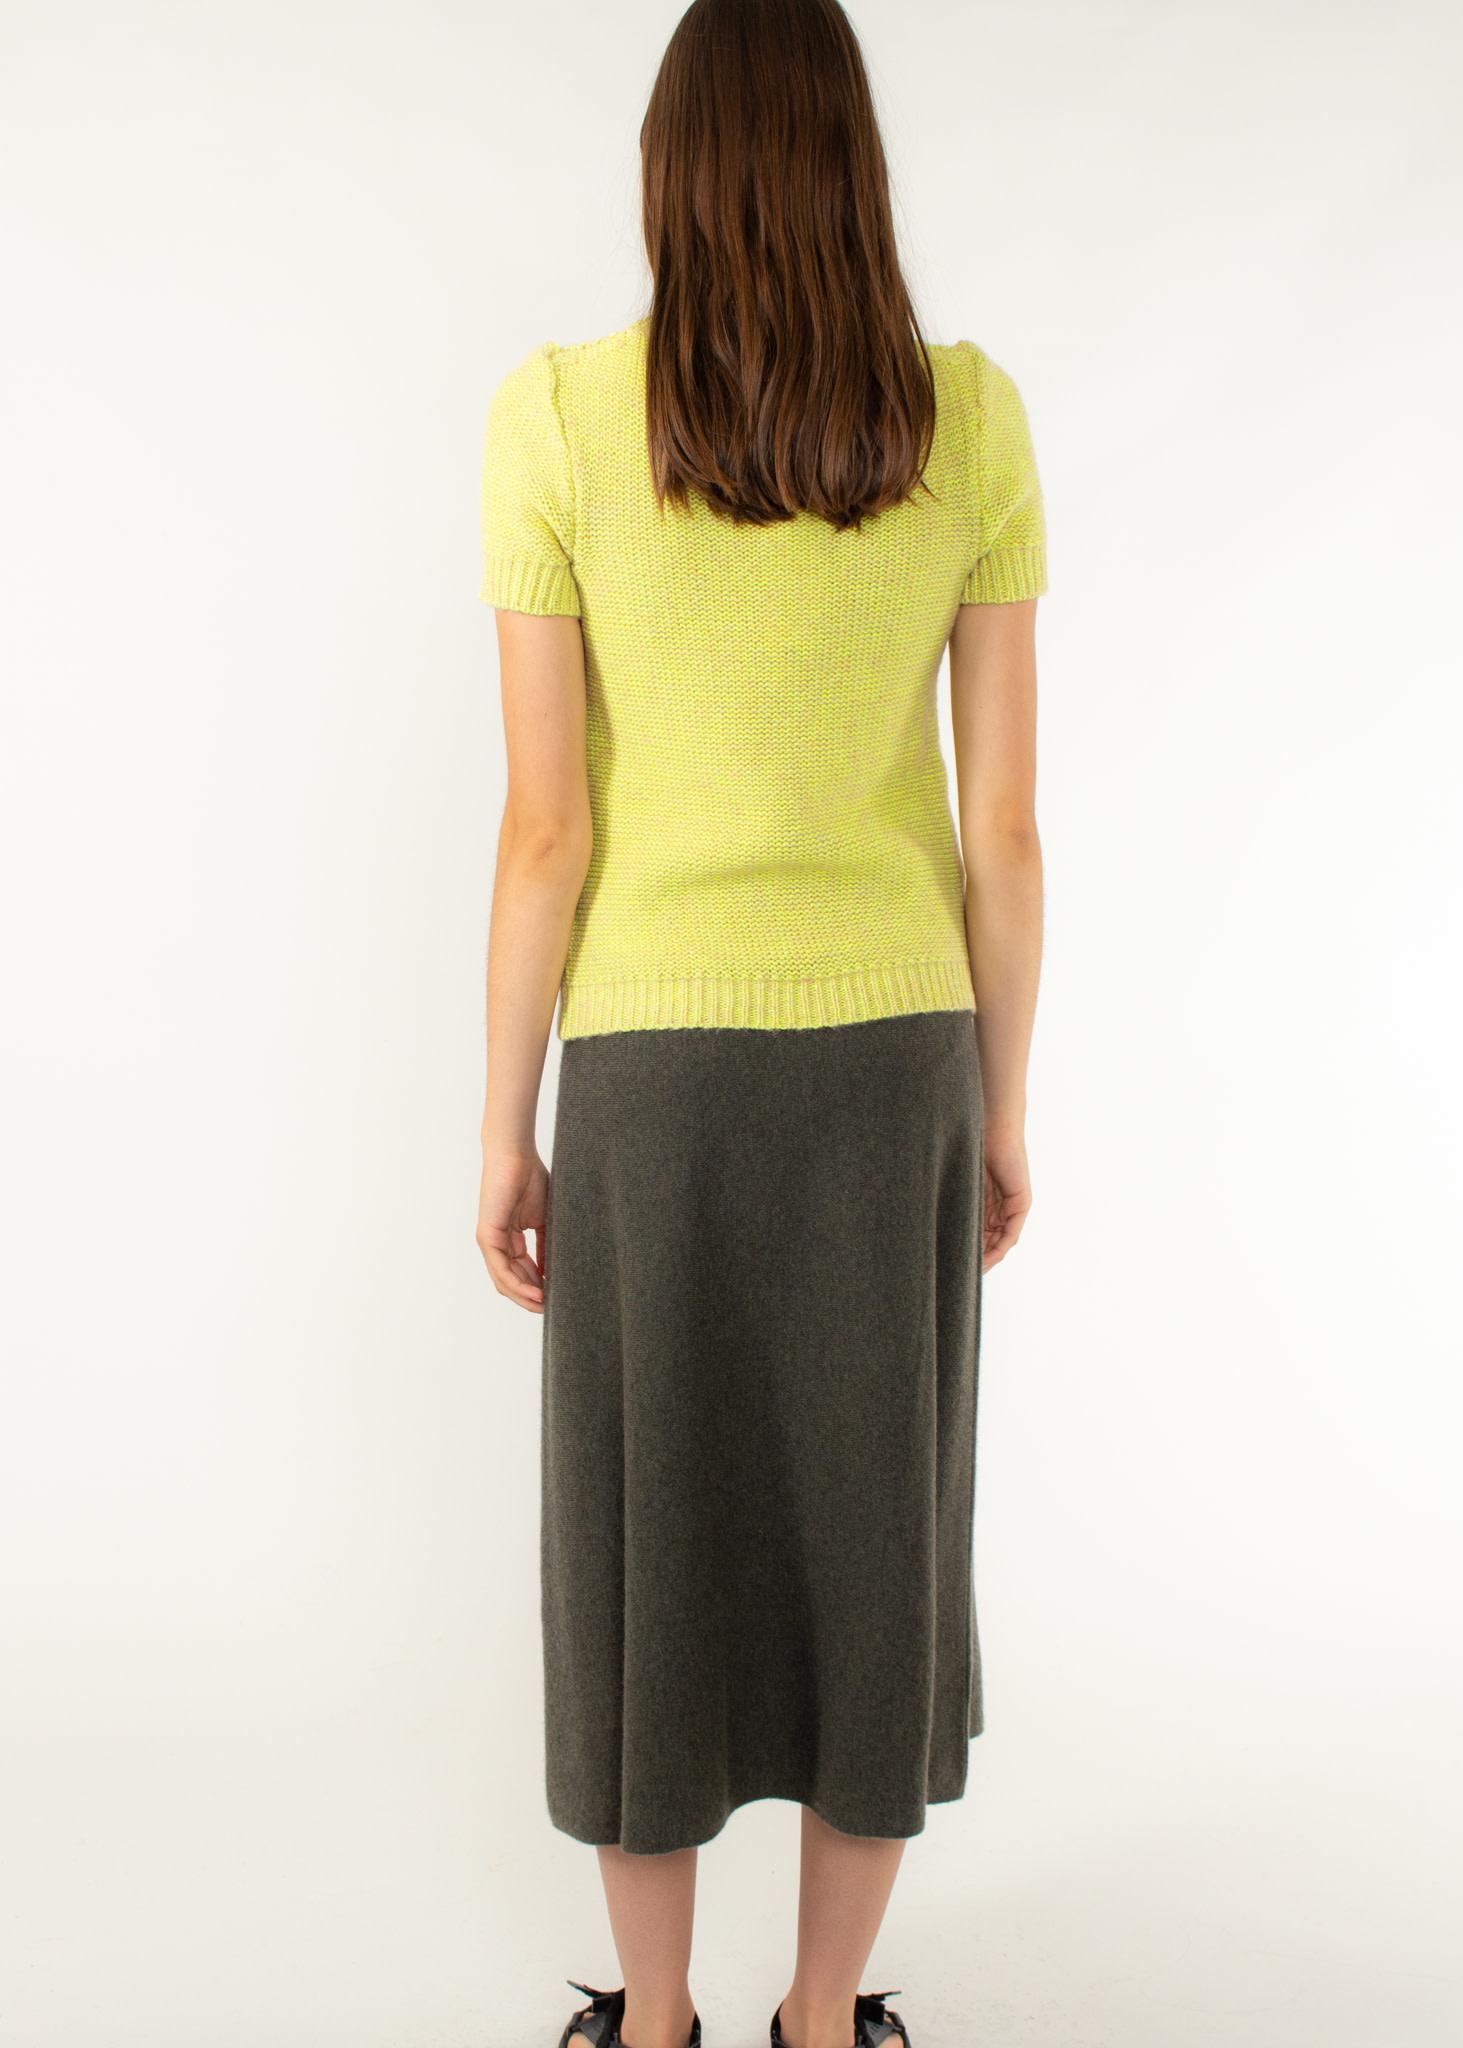 REPEAT Cashmere skirt khaki